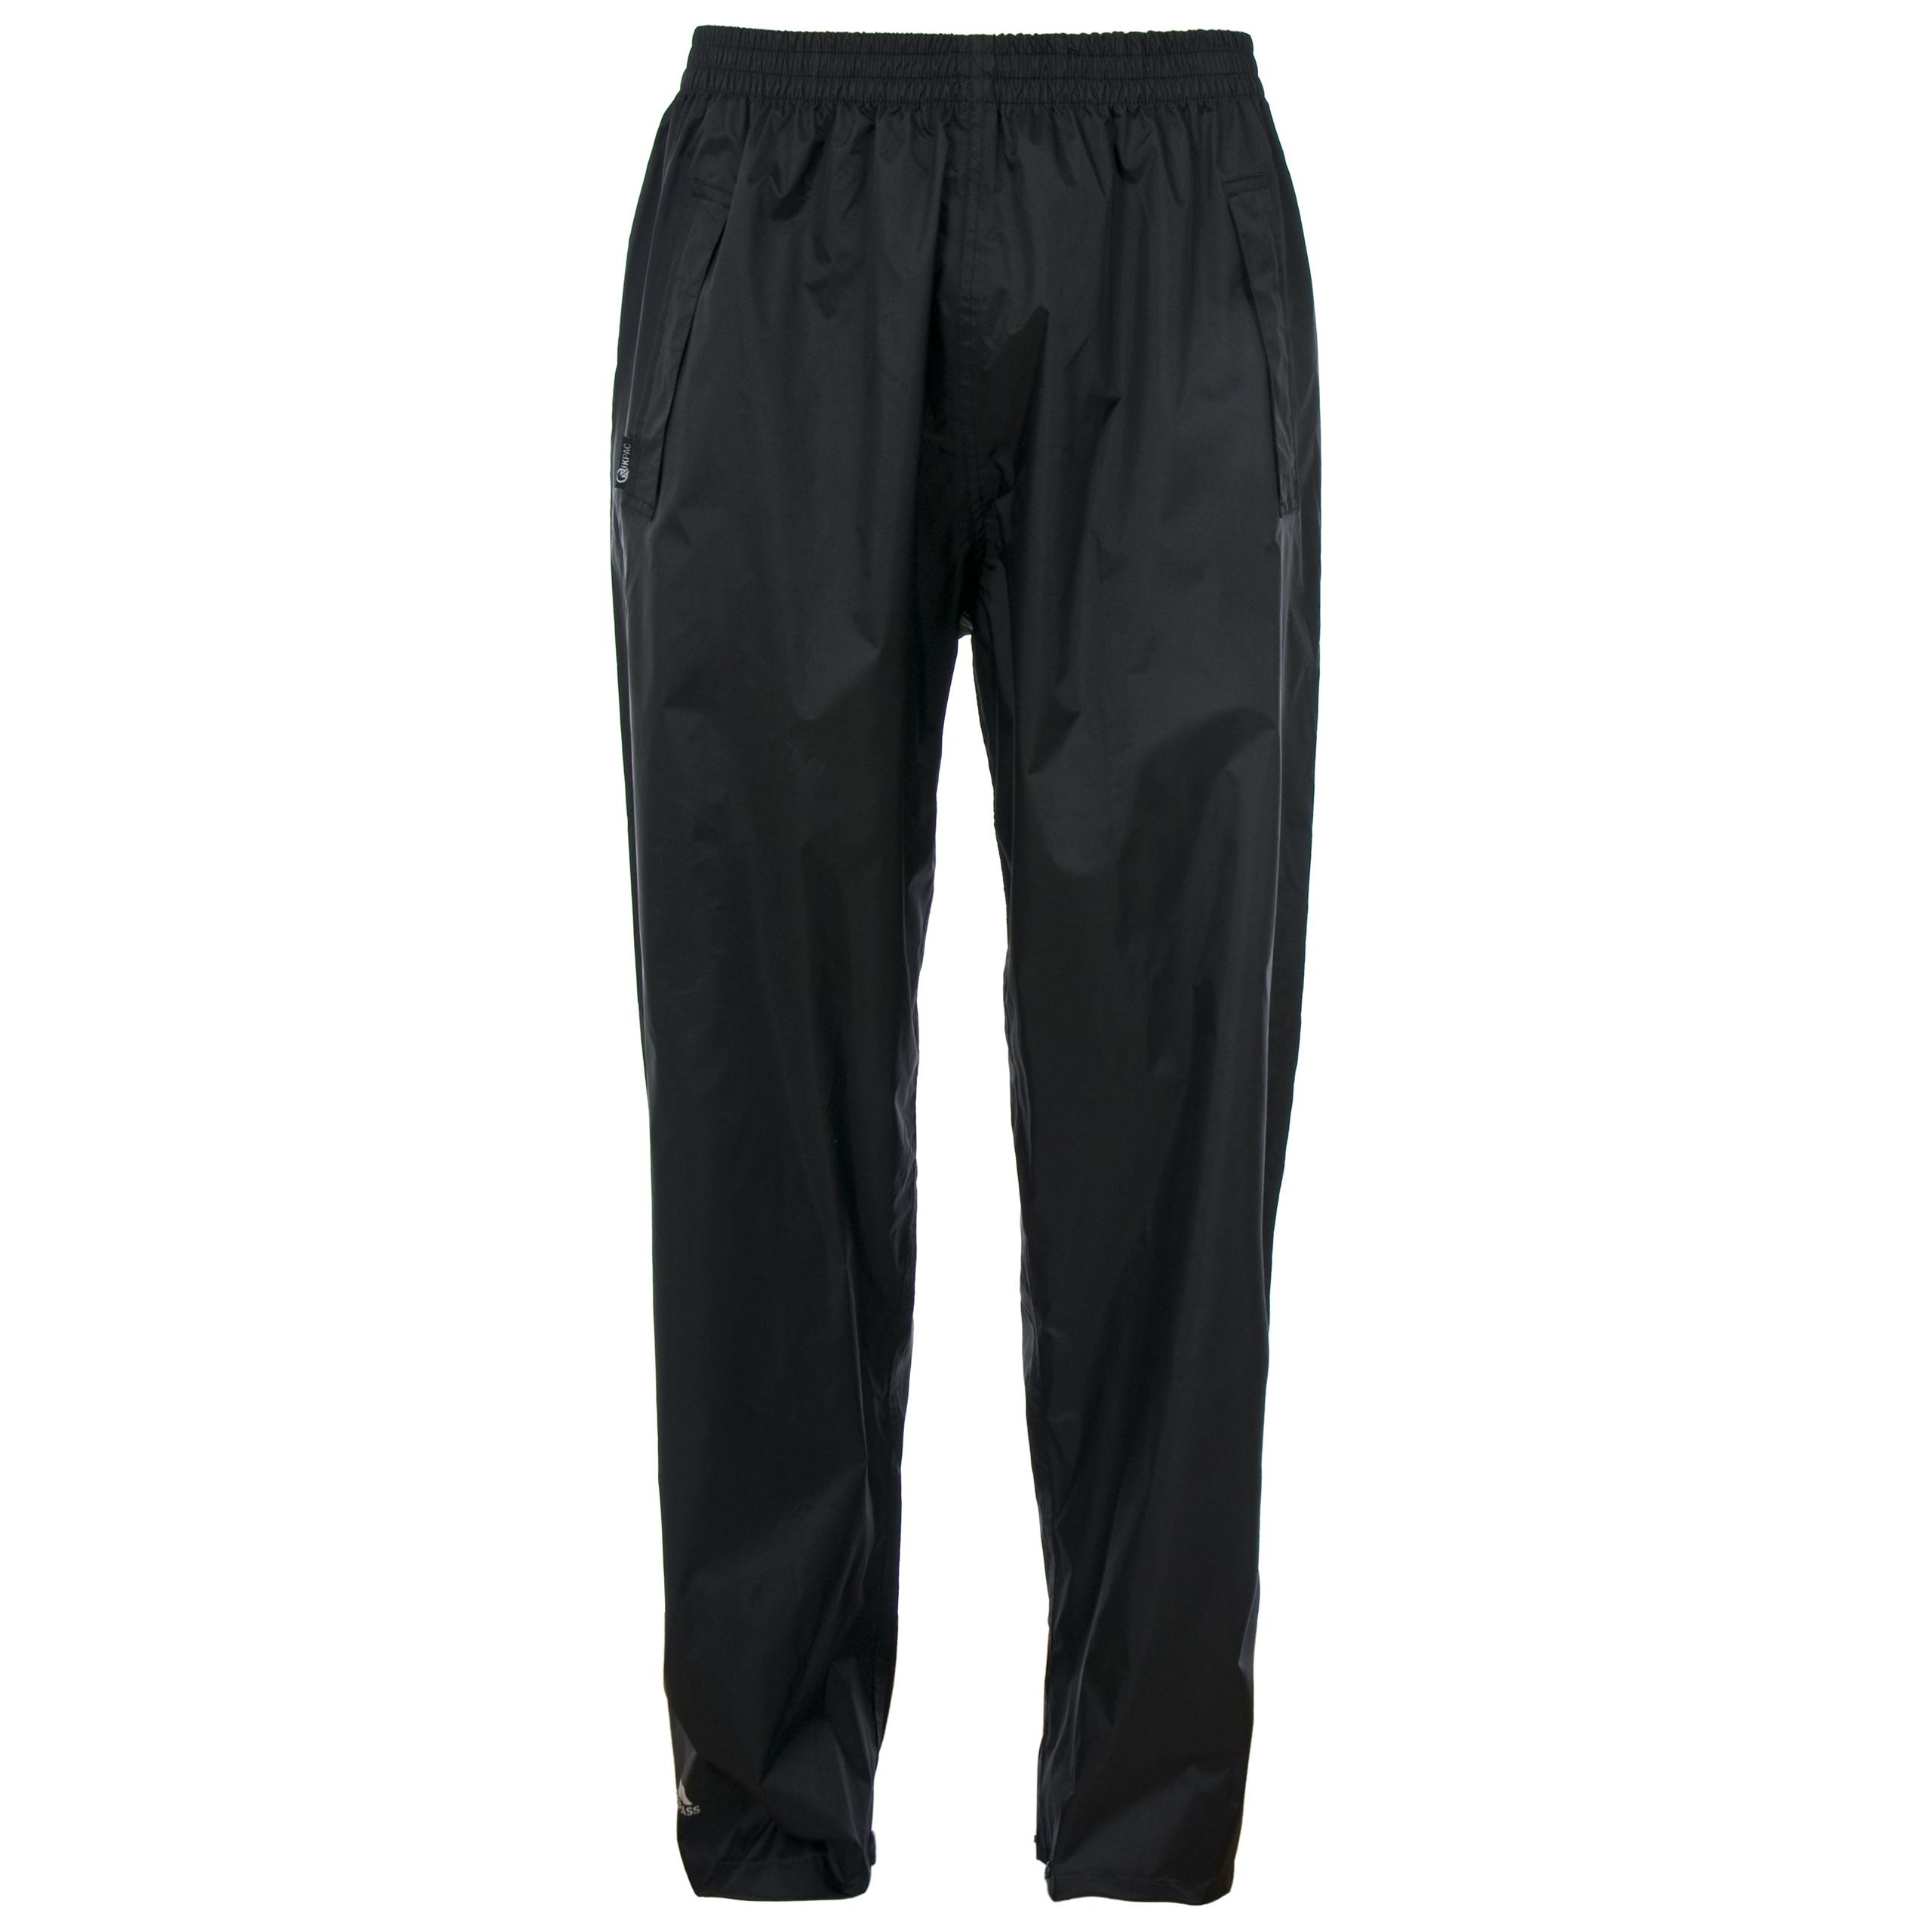 Trespass-Mens-Womens-Waterproof-Trousers-Packaway-Breathable-Qikpac thumbnail 14